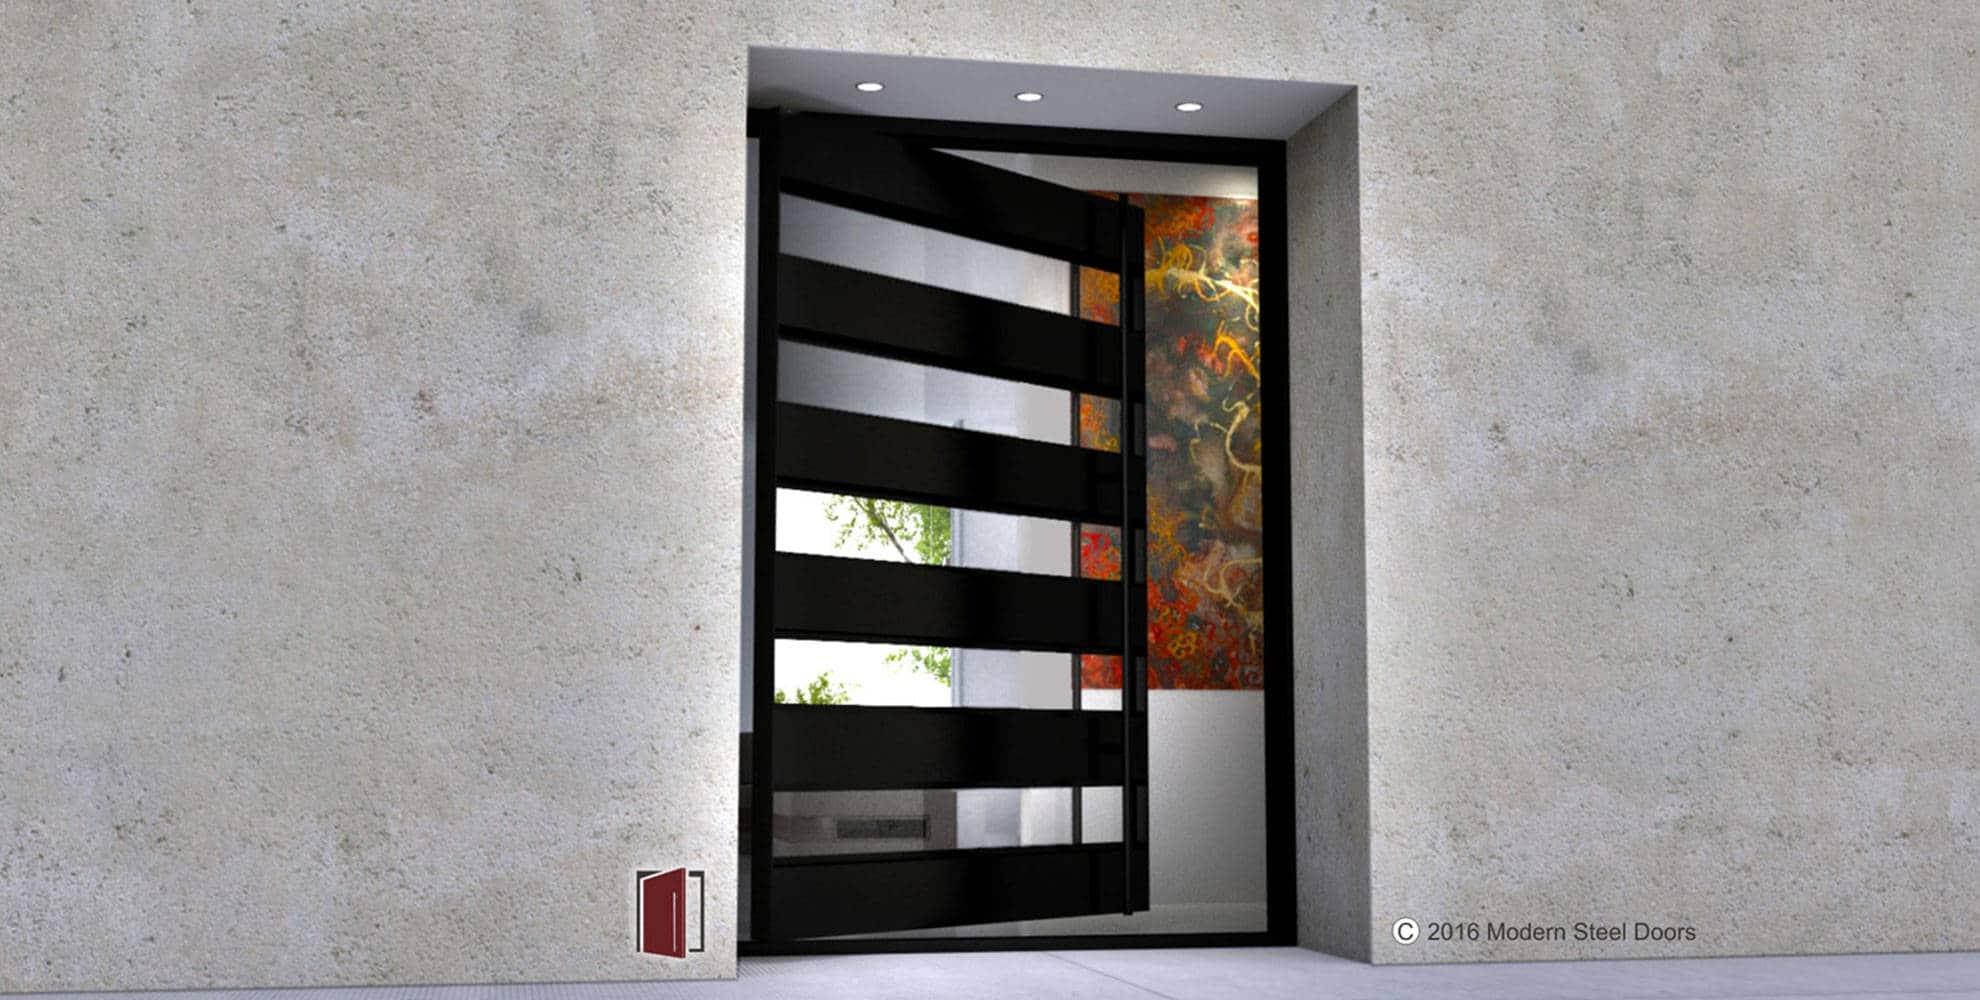 awe inspiring modern steel doors free home designs photos ideas pokmenpayus